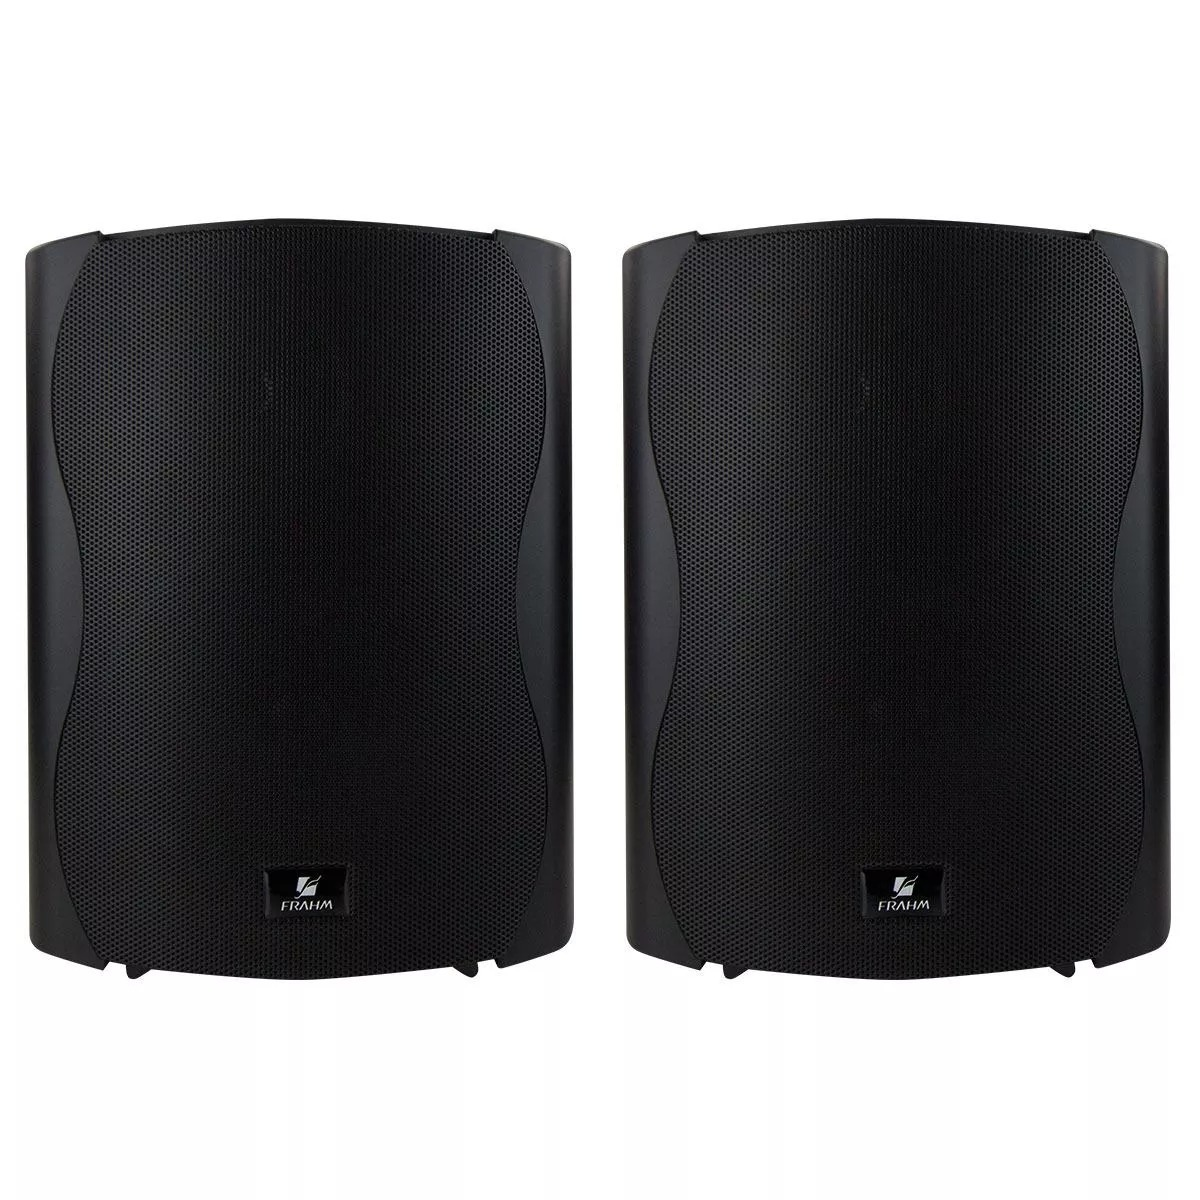 Par Caixas Som Ativa + Passiva Frahm Ps Plus Bt-6 Bluetooth Preta